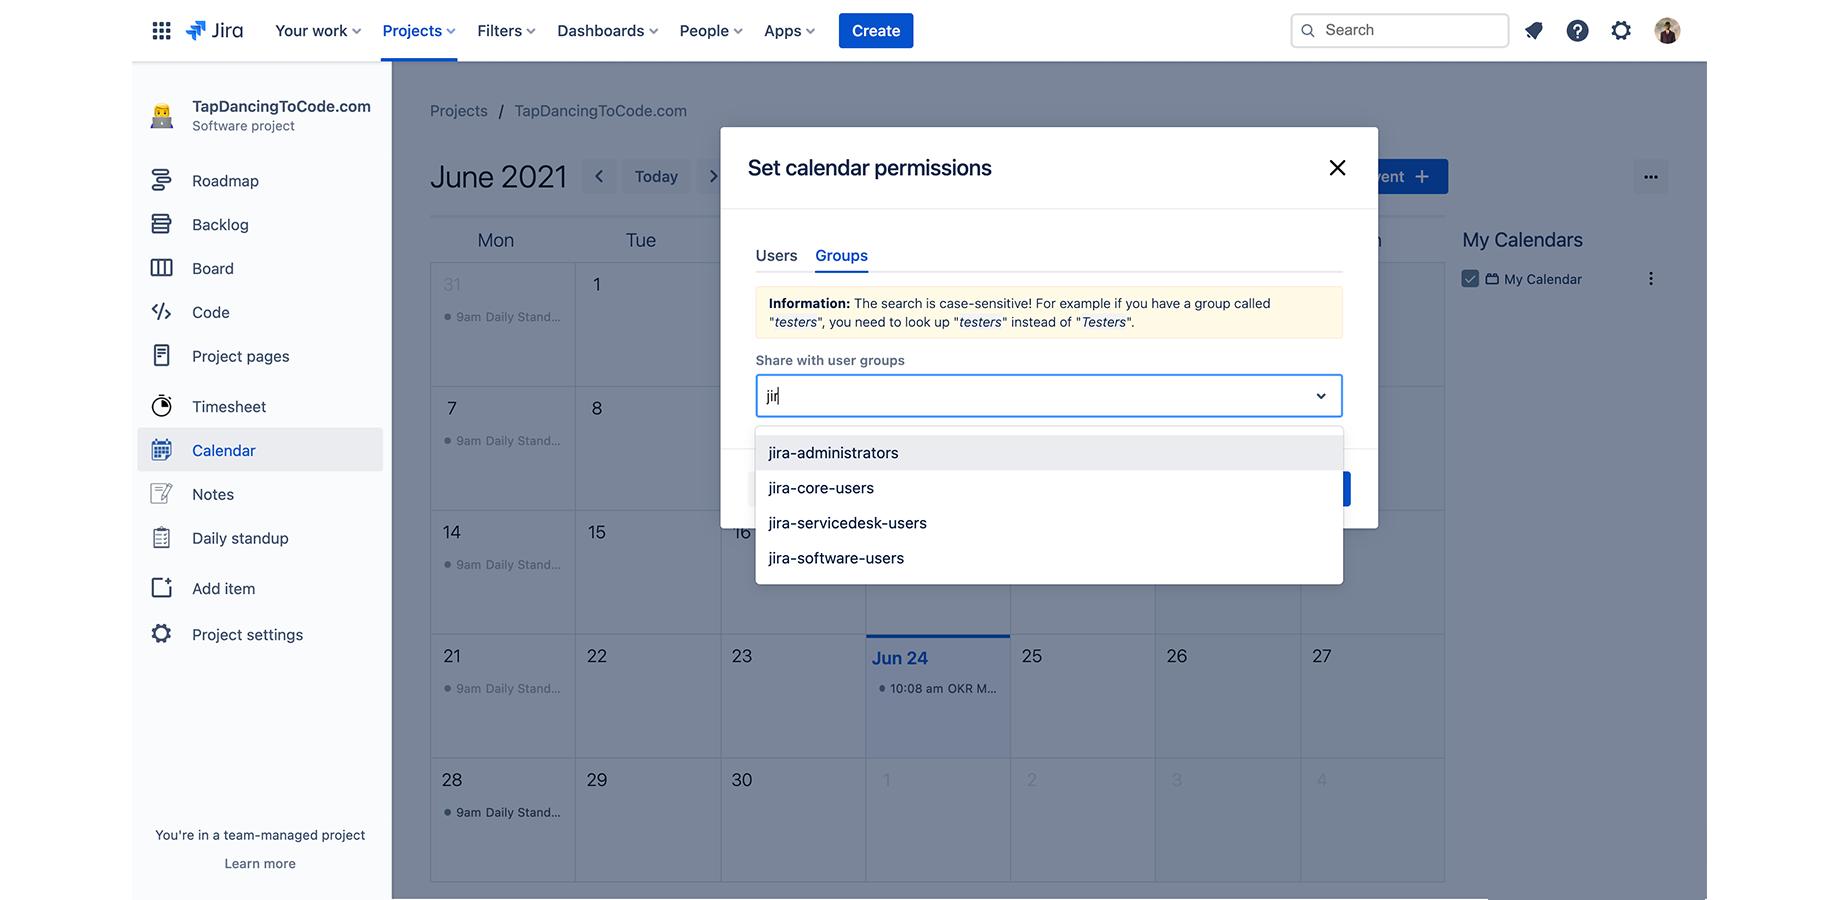 jira calendar share users